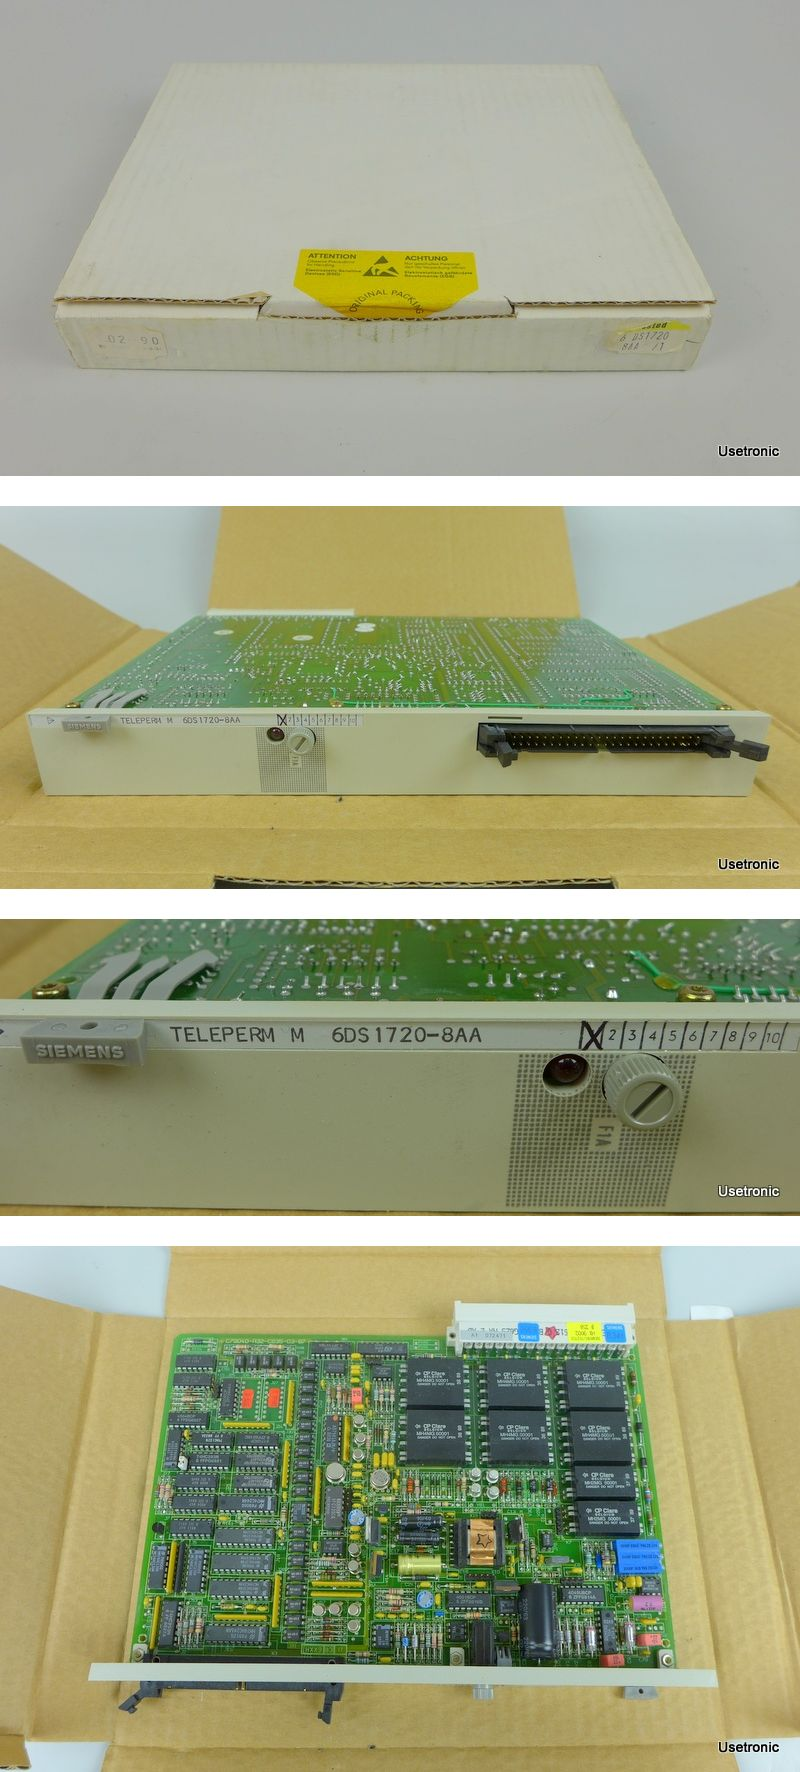 Siemens Teleperm M 6DS1720-8AA 6DS1 720-8AA